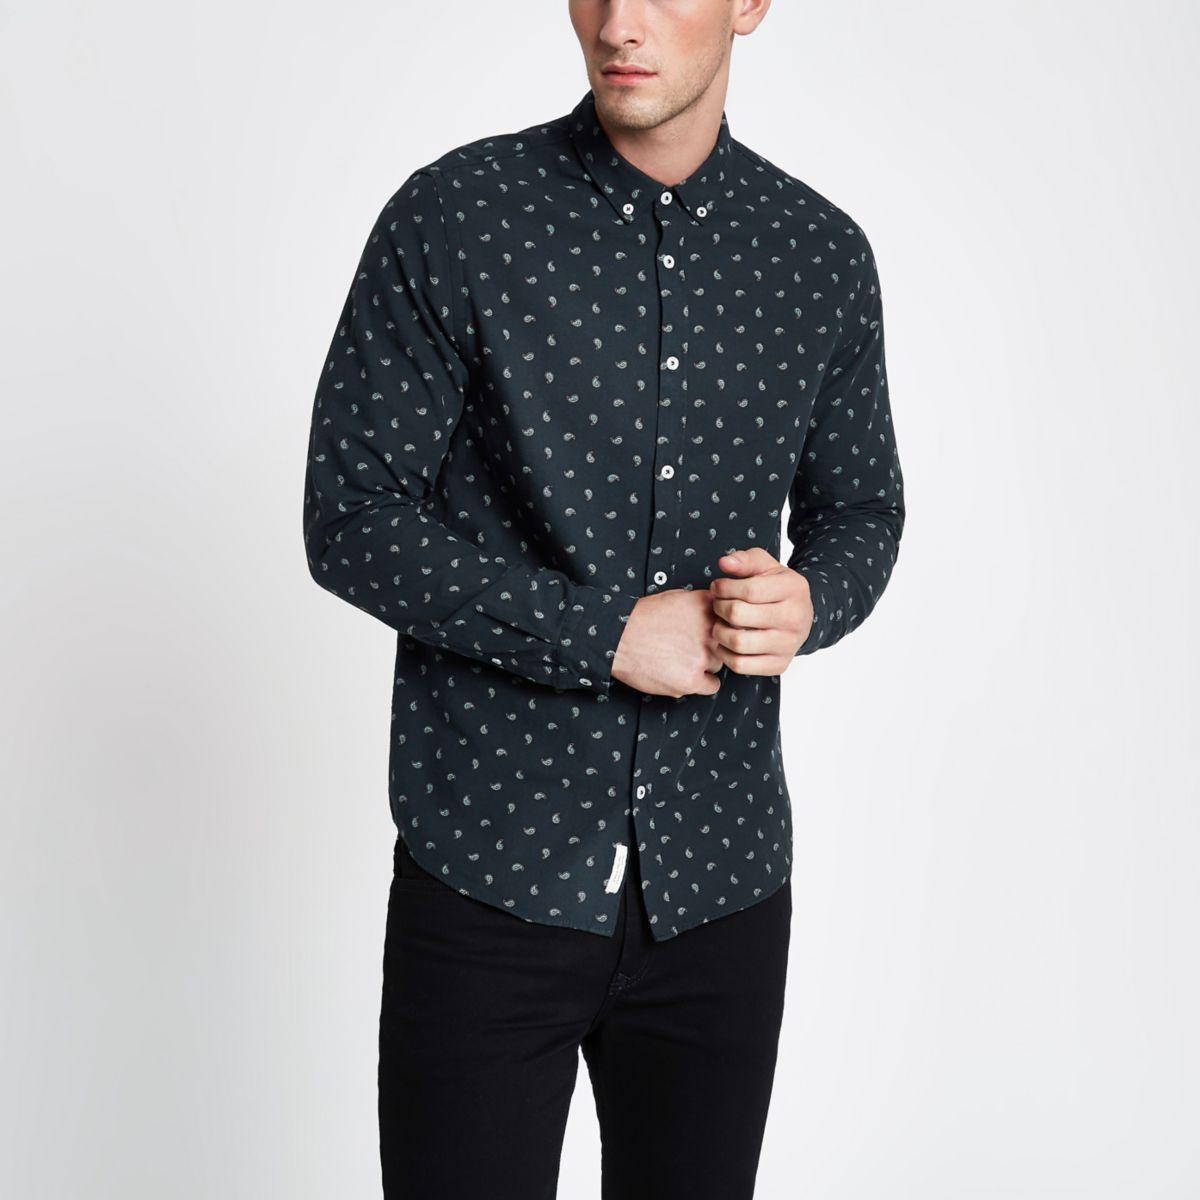 Navy paisley long sleeve Oxford shirt